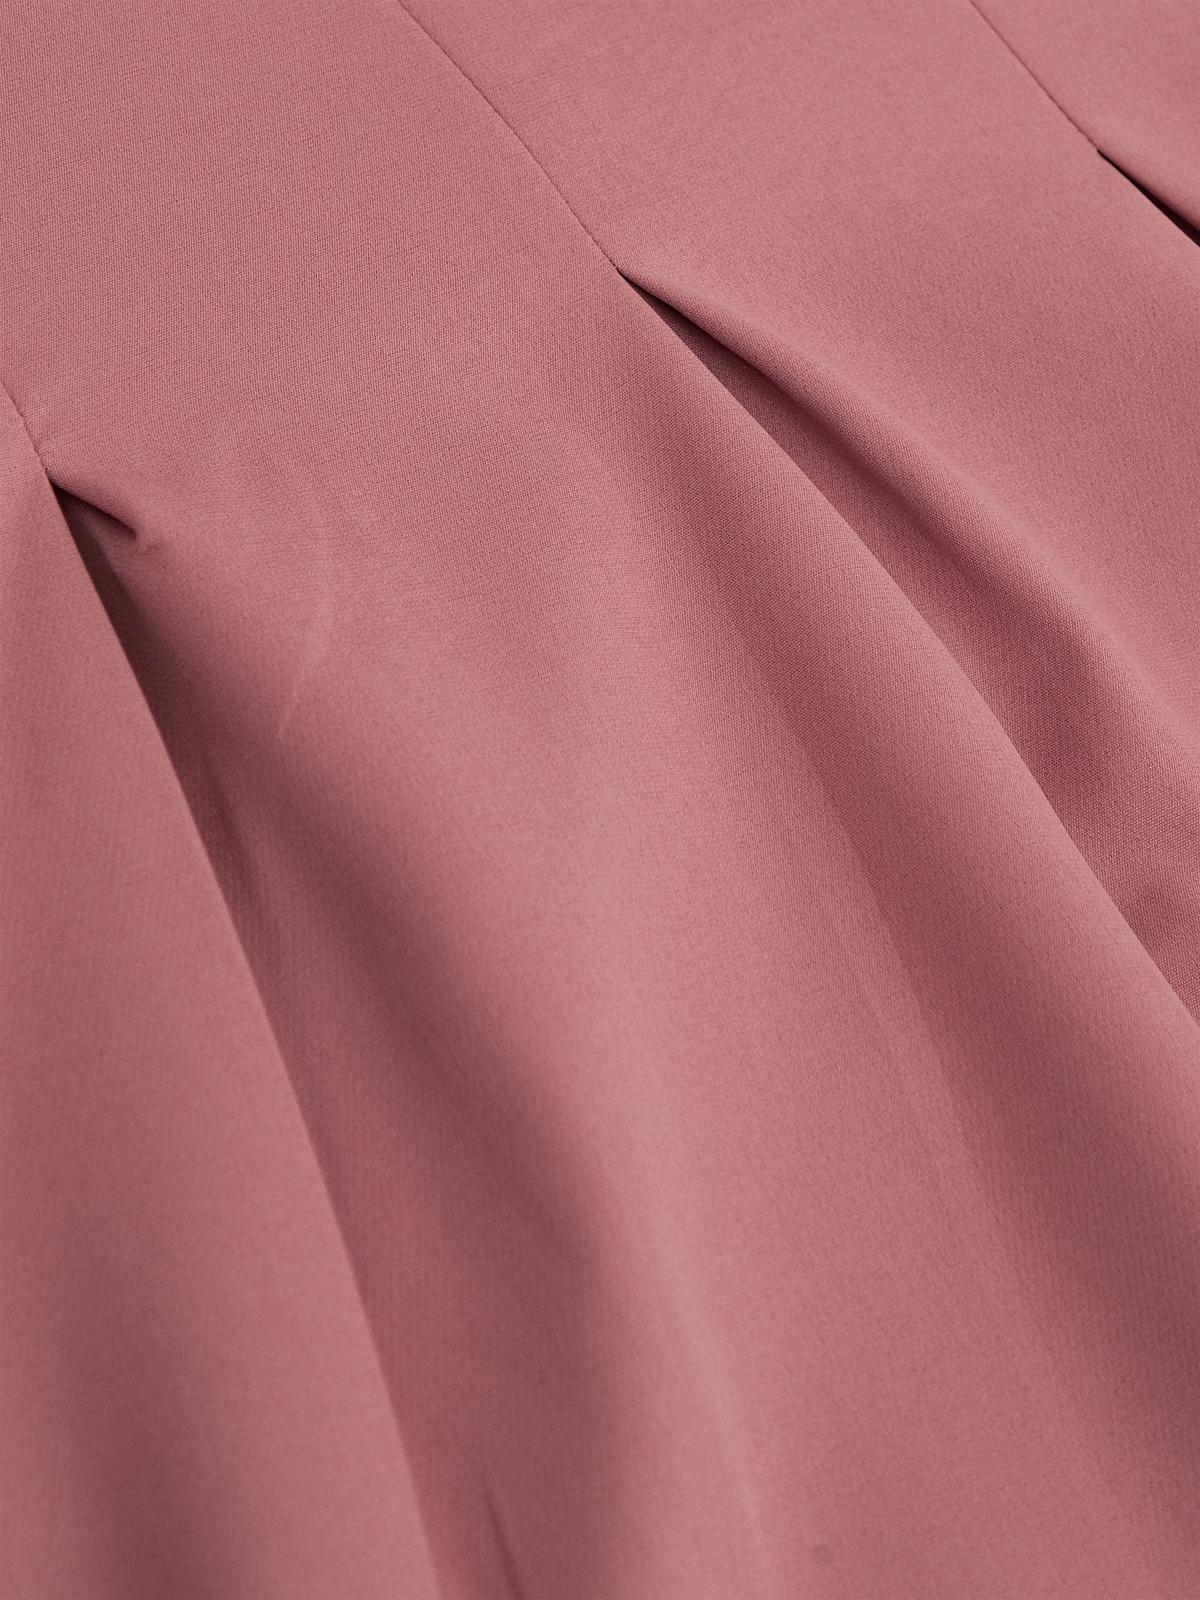 Midi Side Pockets Pleated Dress Pink